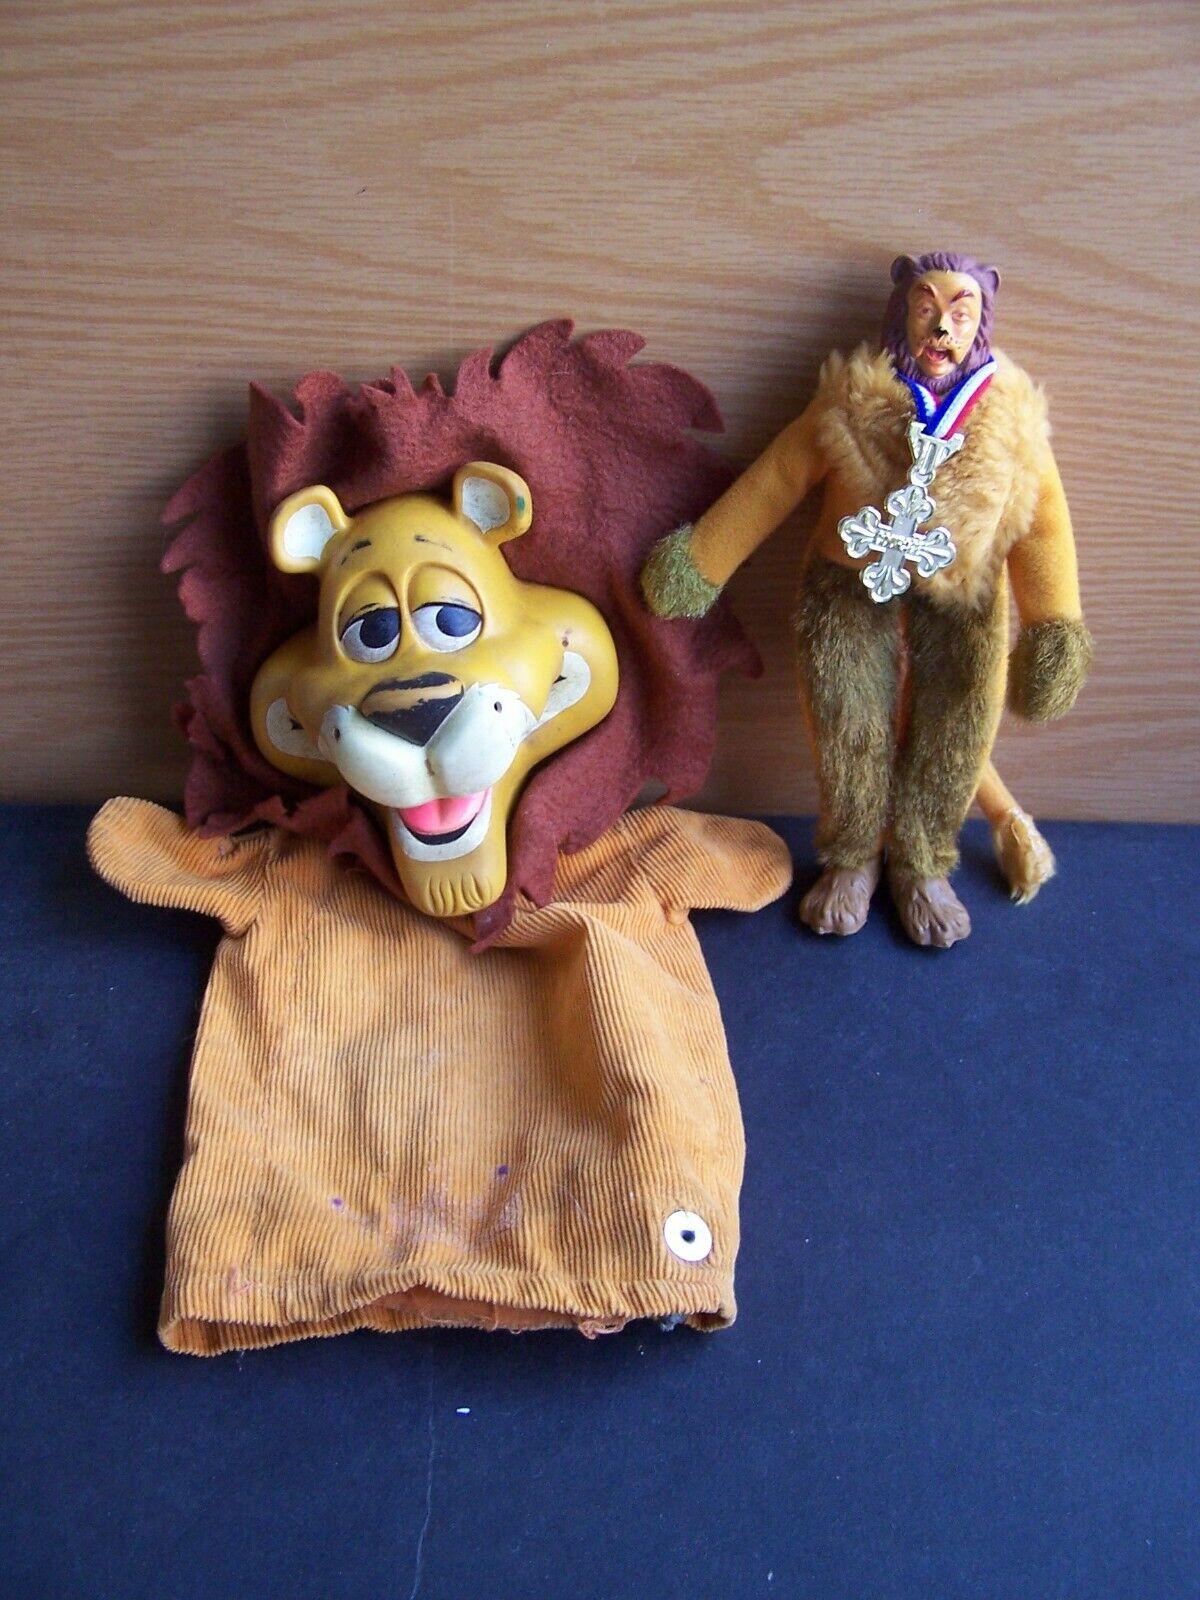 2 LIONS - Cowardly Lion Oz Mego + Linus Lionhearted Hand Puppet Mattel Vintage